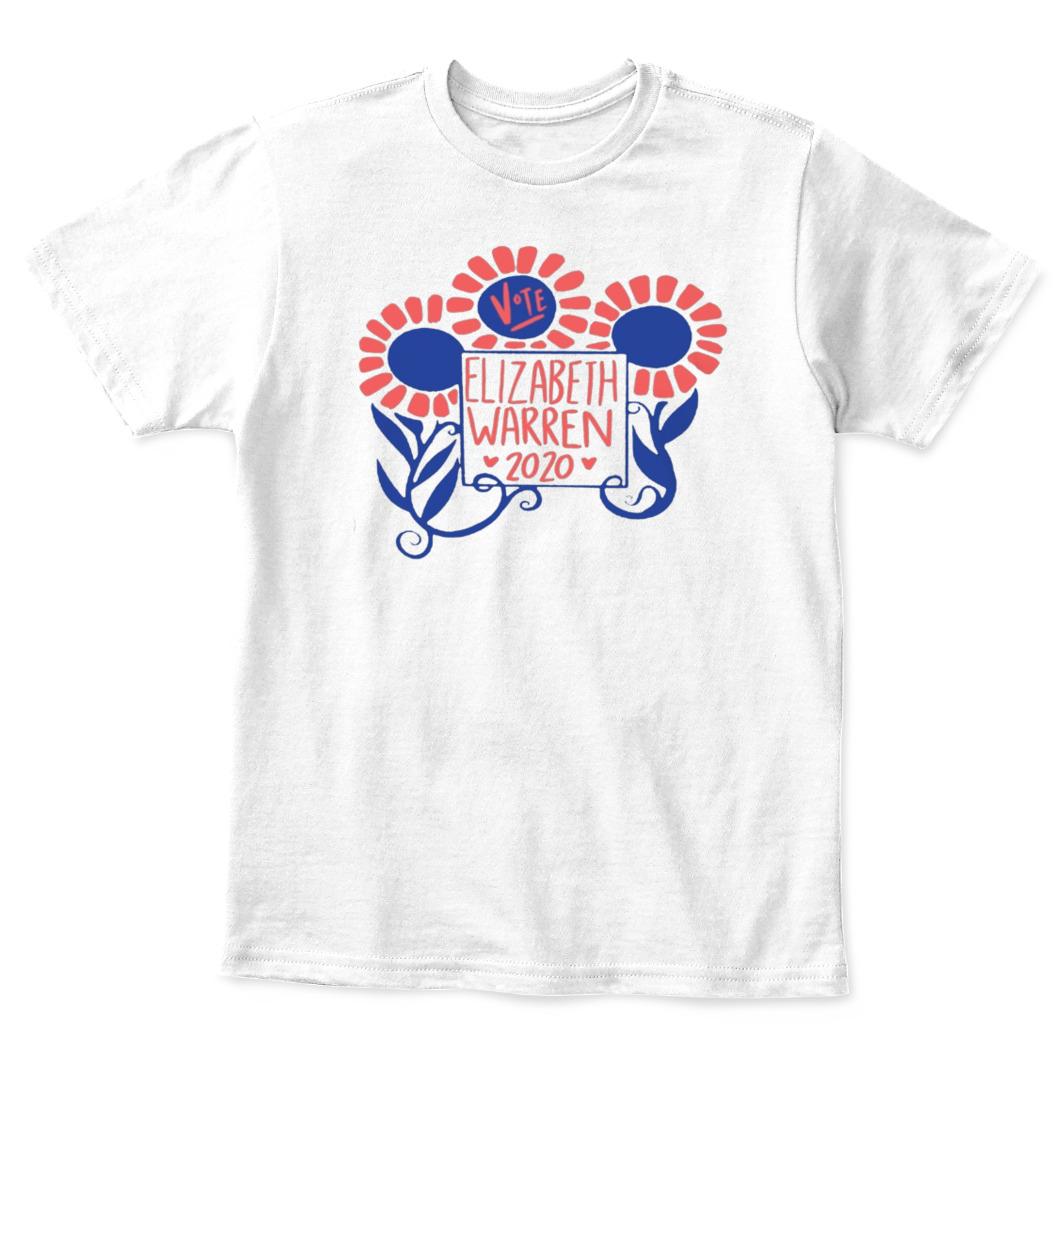 Mens Short Tank Youth Long Sleeve Womens Elizabeth Warren 2020 T-Shirt